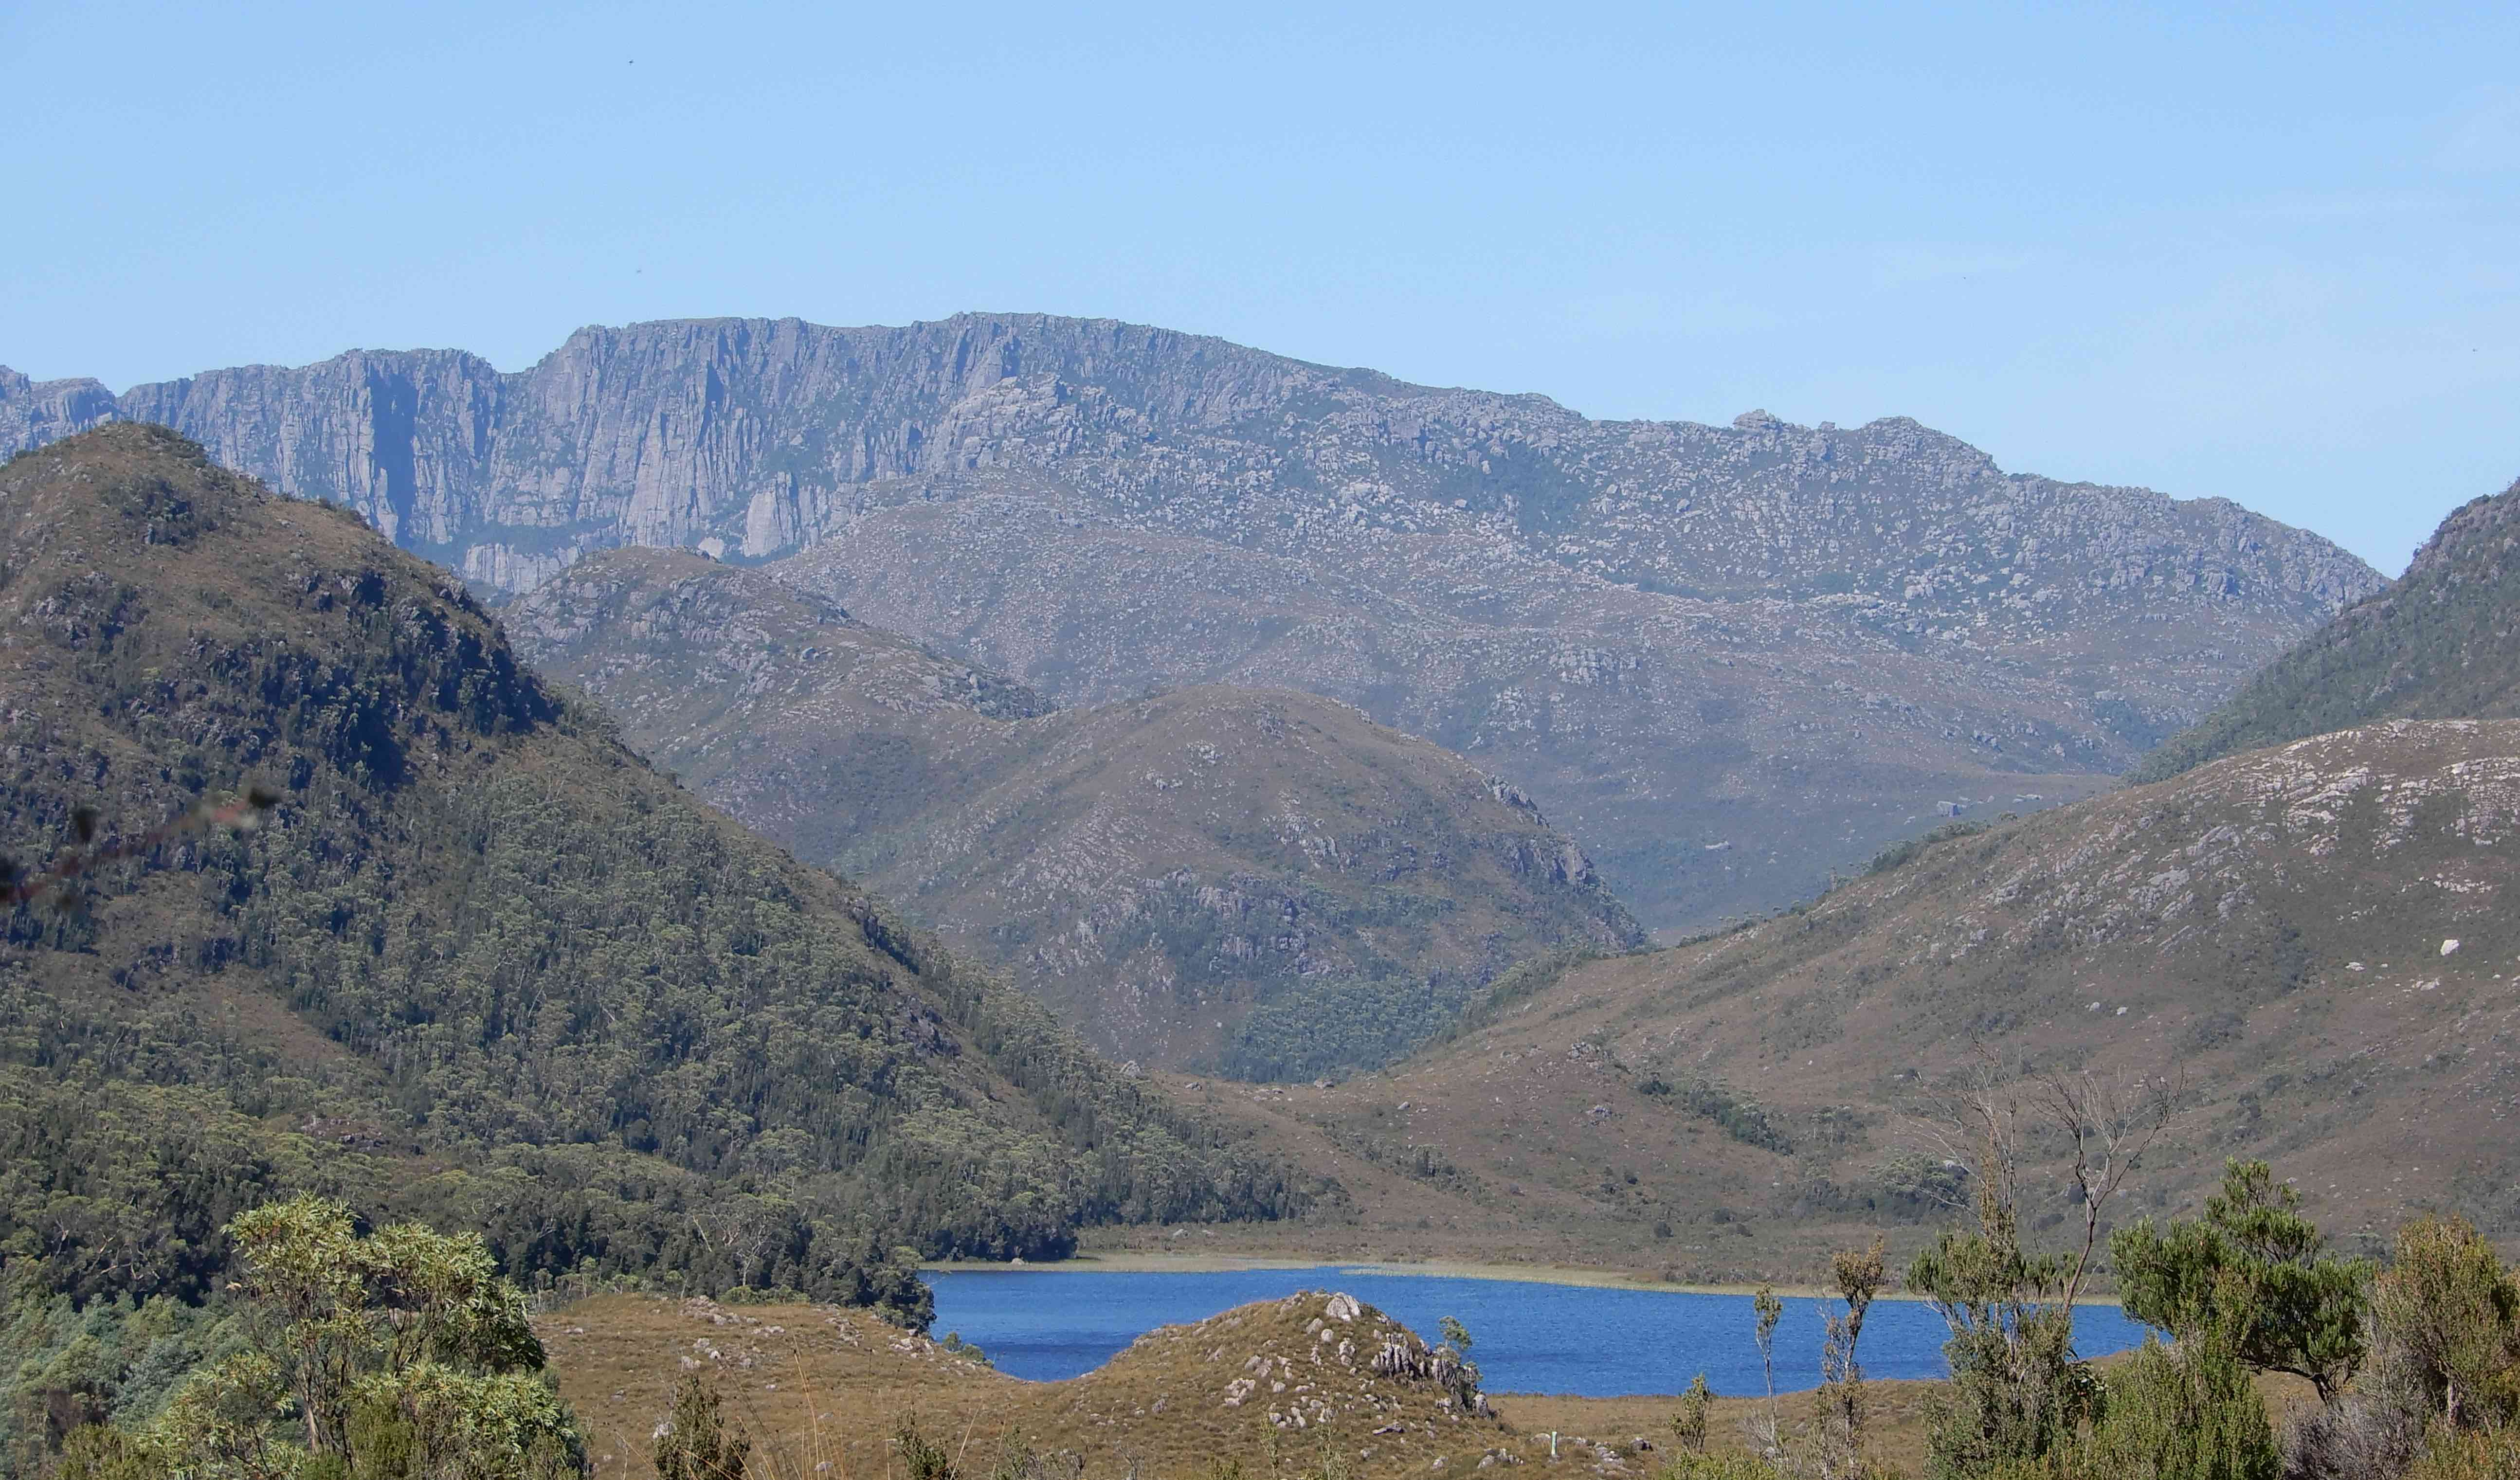 5.Mount Tyndall